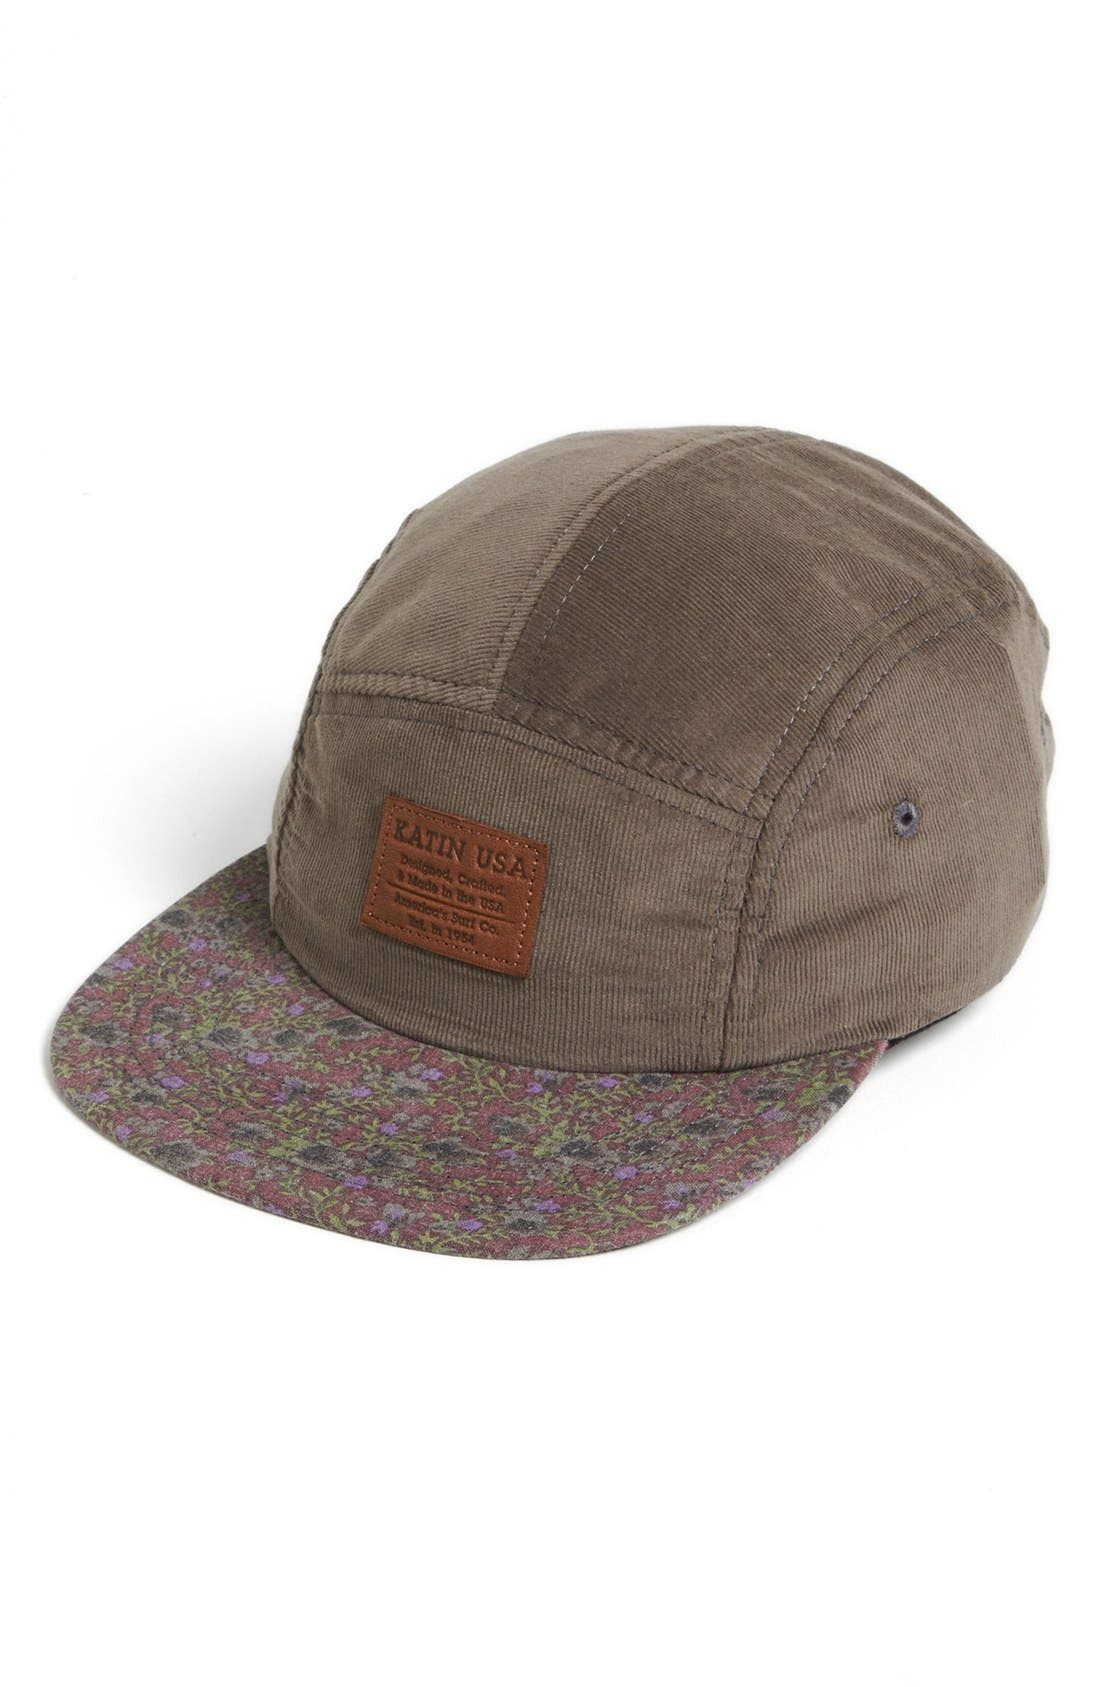 Main Image - Katin 'Garden' Cap